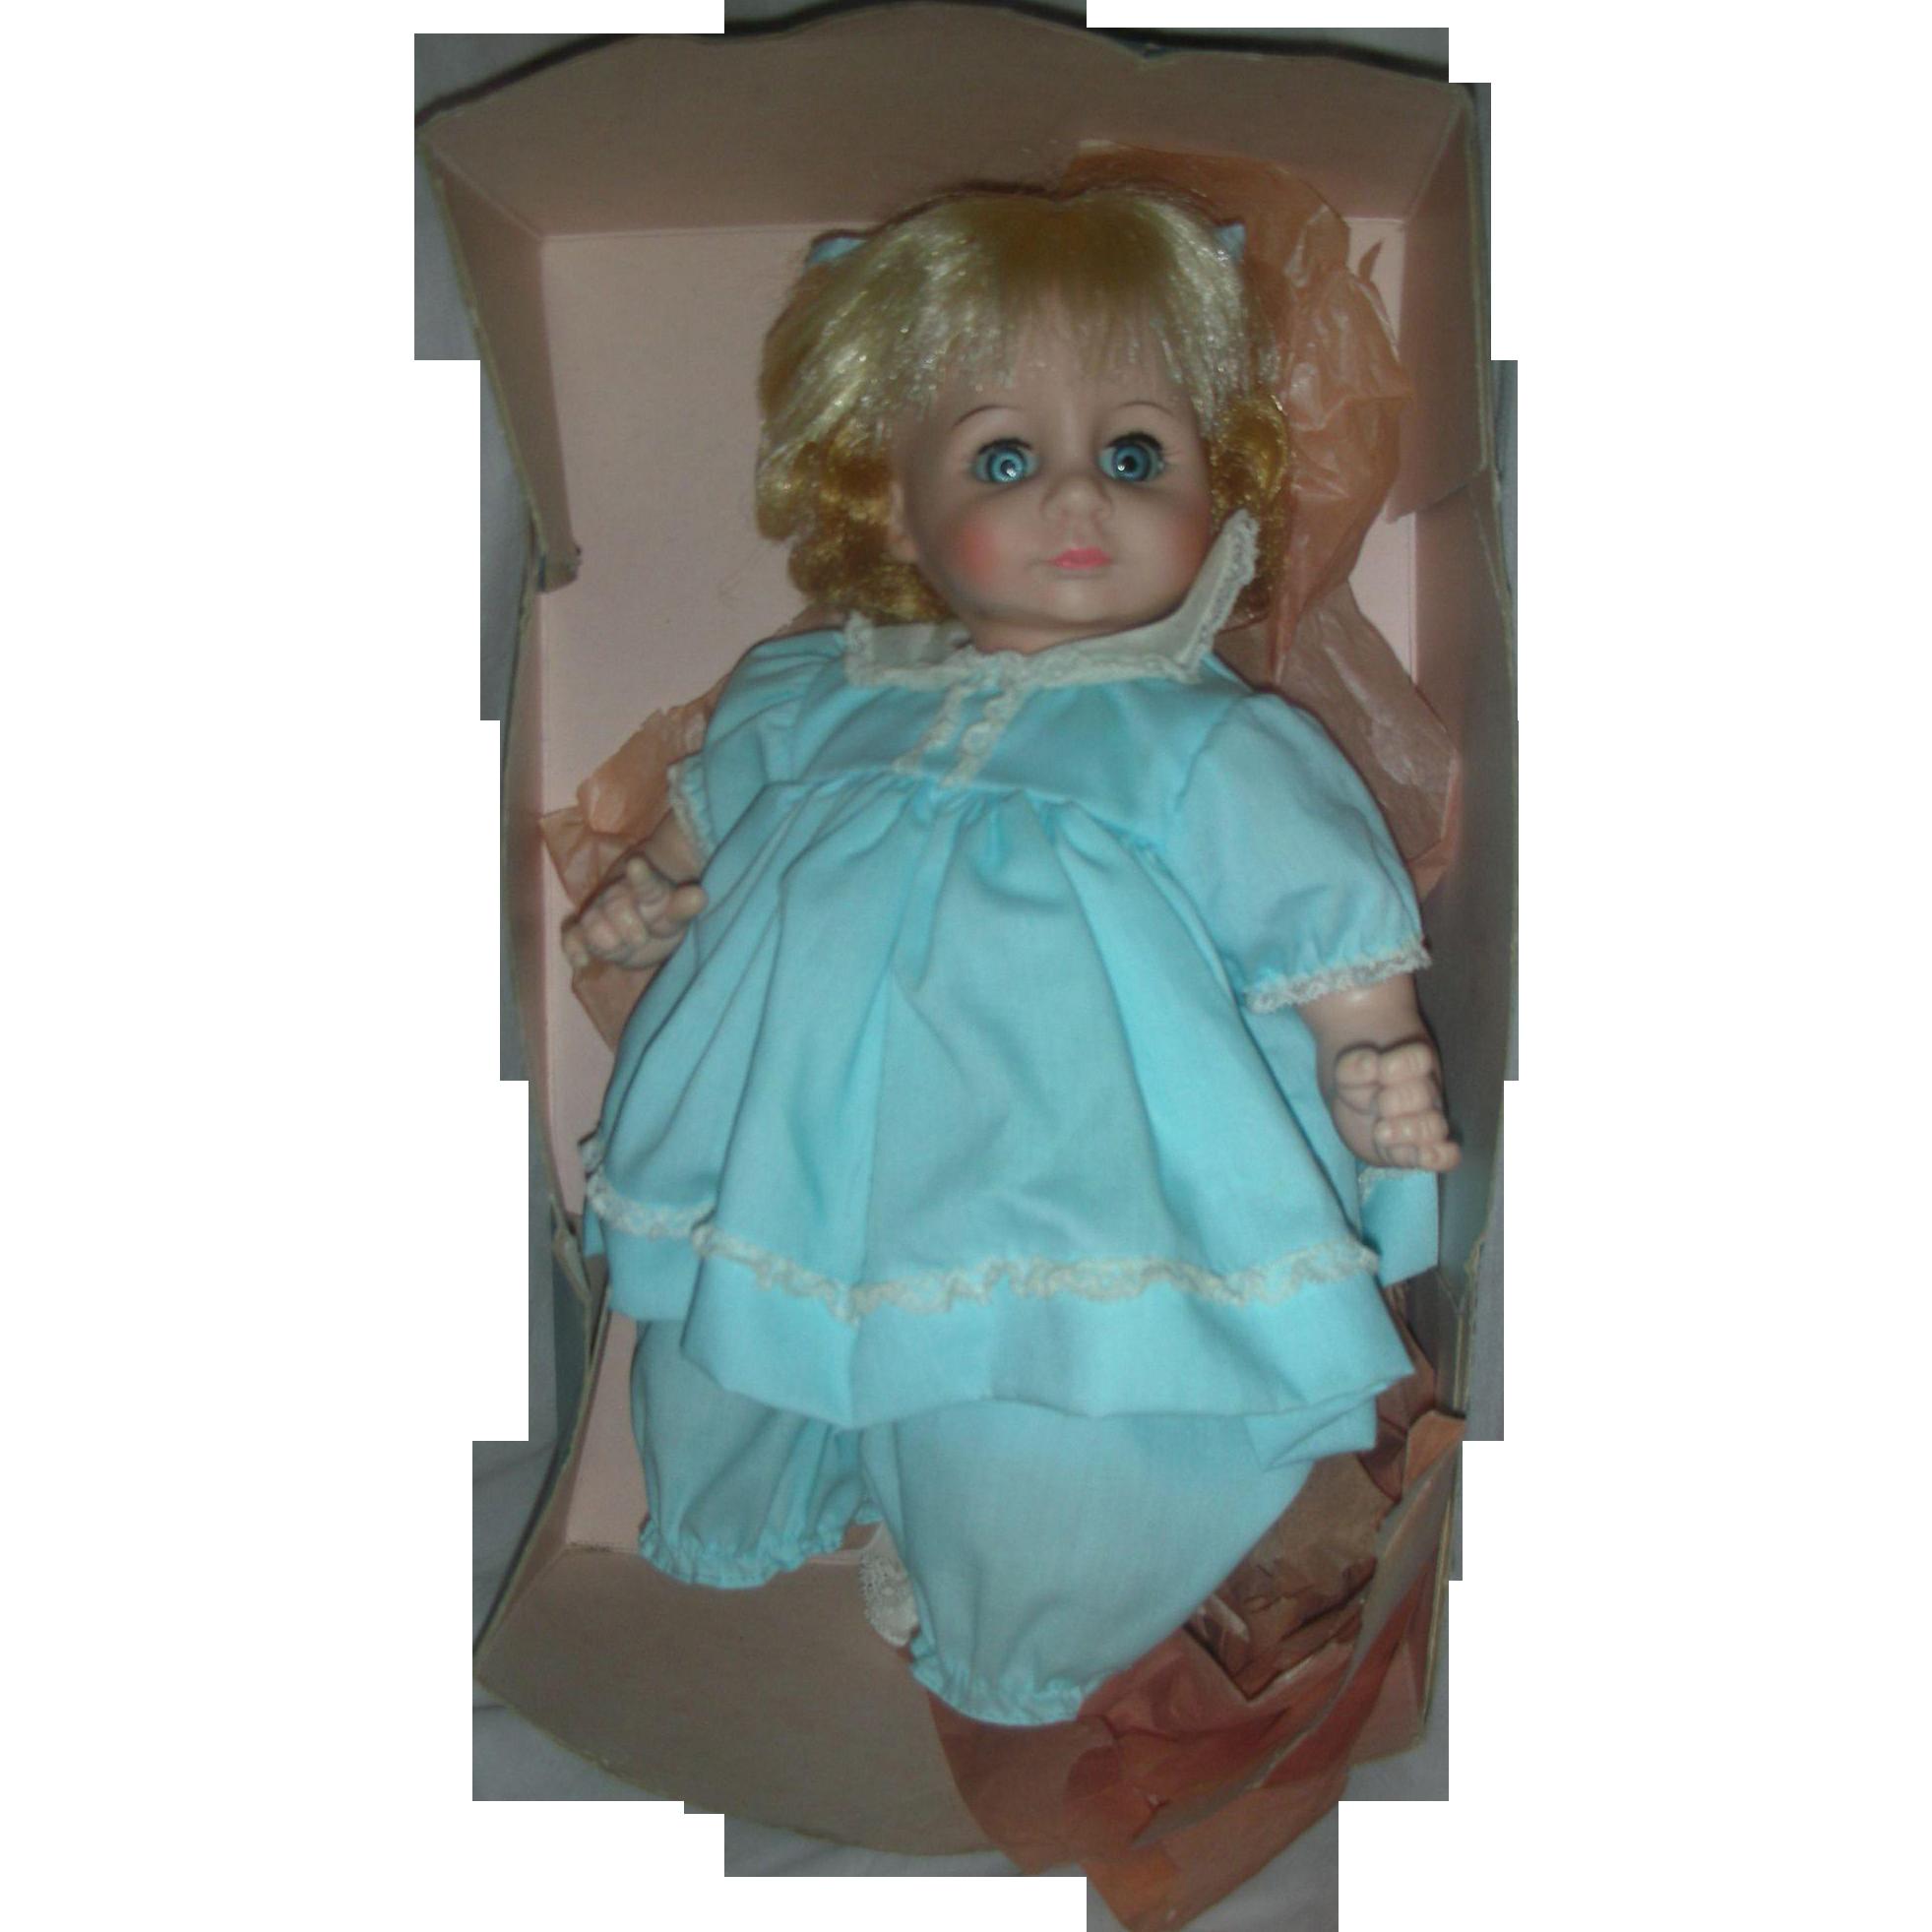 Vintage Madame Alexander Baby Janie Doll in Original Box